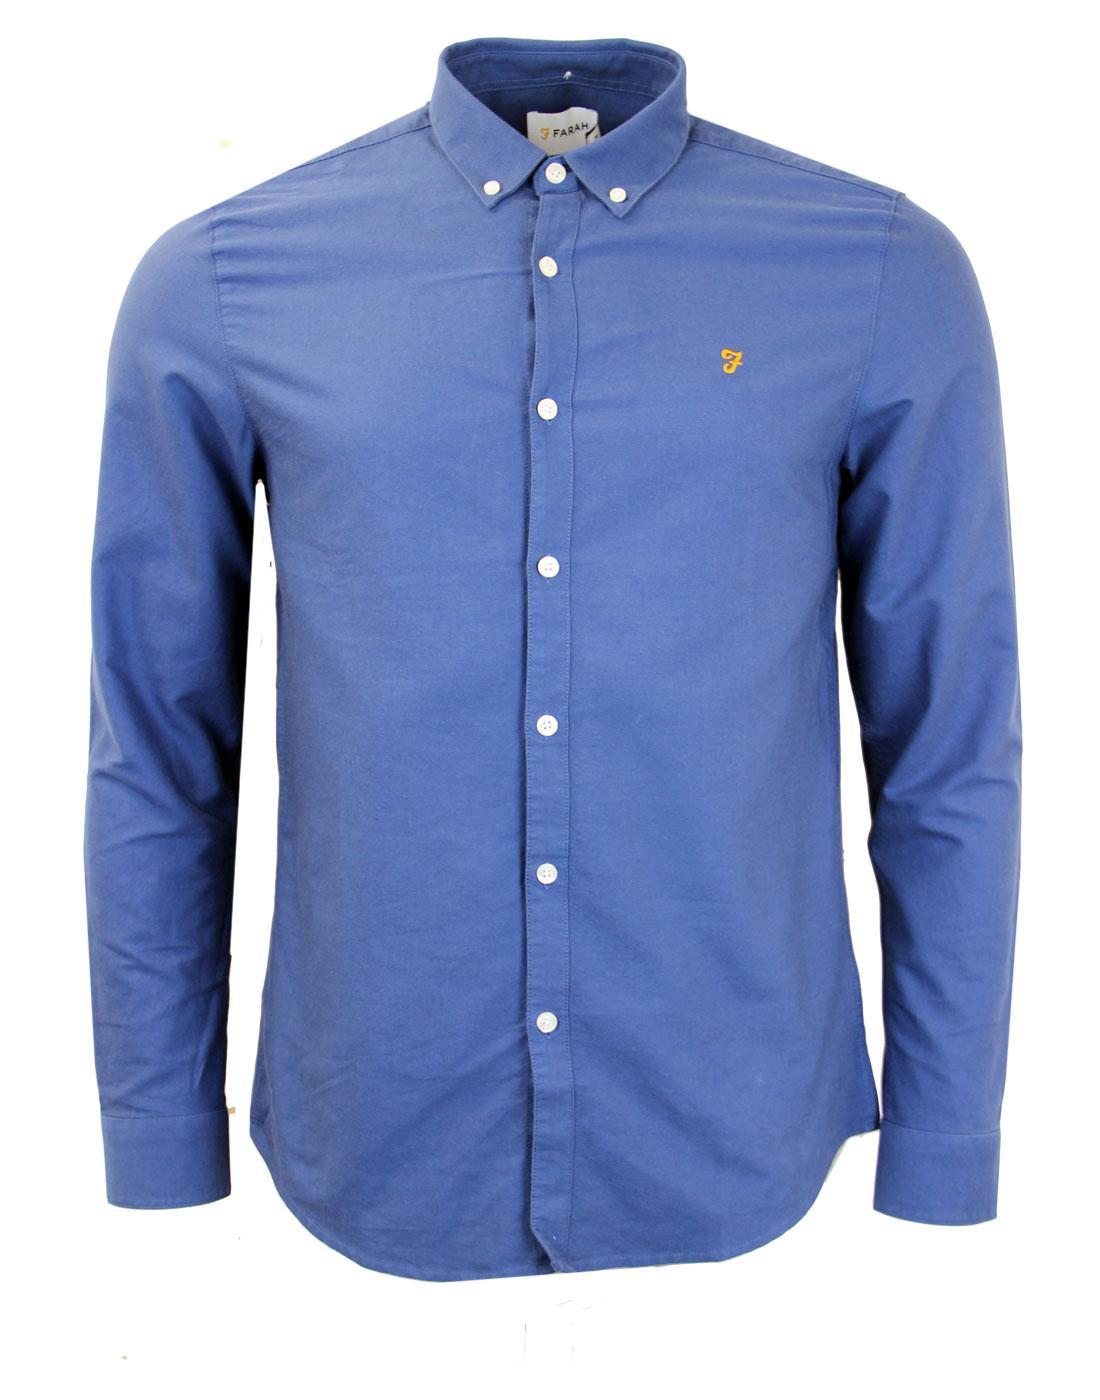 Brewer FARAH VINTAGE Retro 60s Mod Oxford Shirt DB